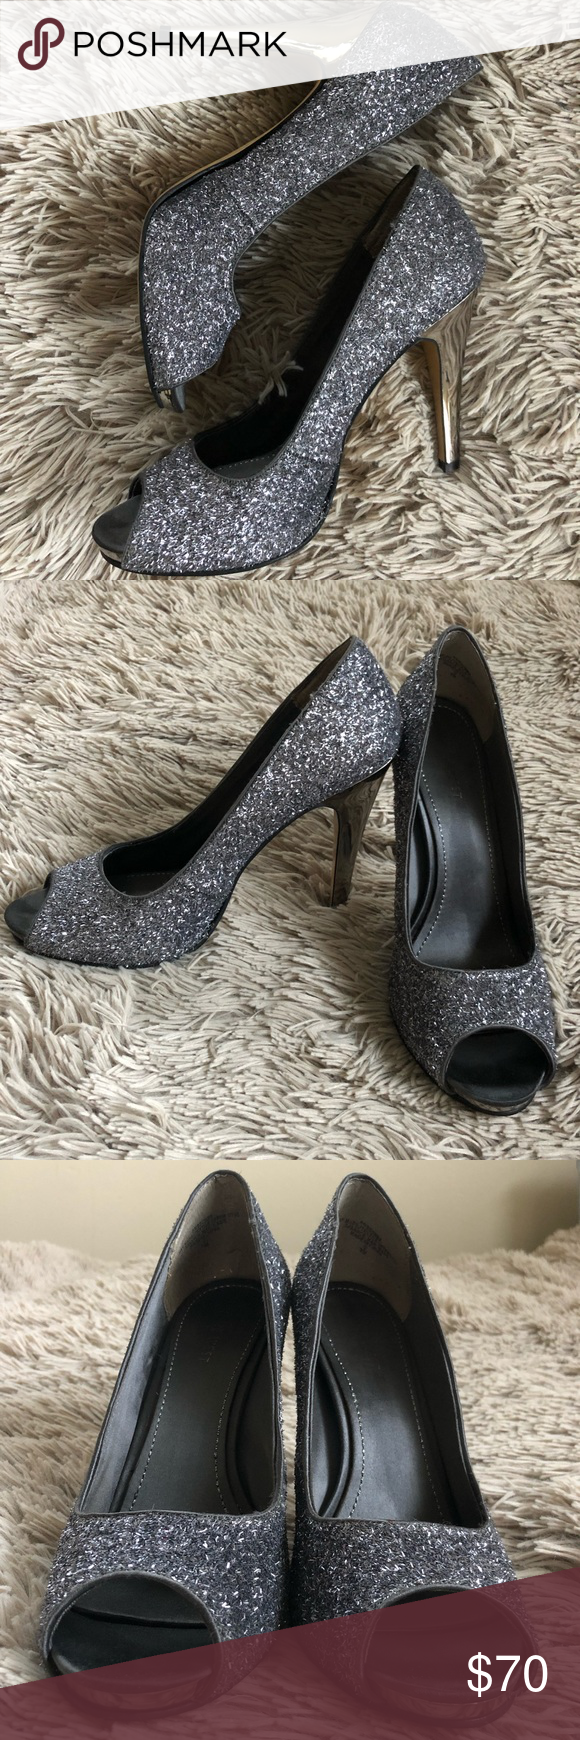 Stiletto Glitter Heel #partytime